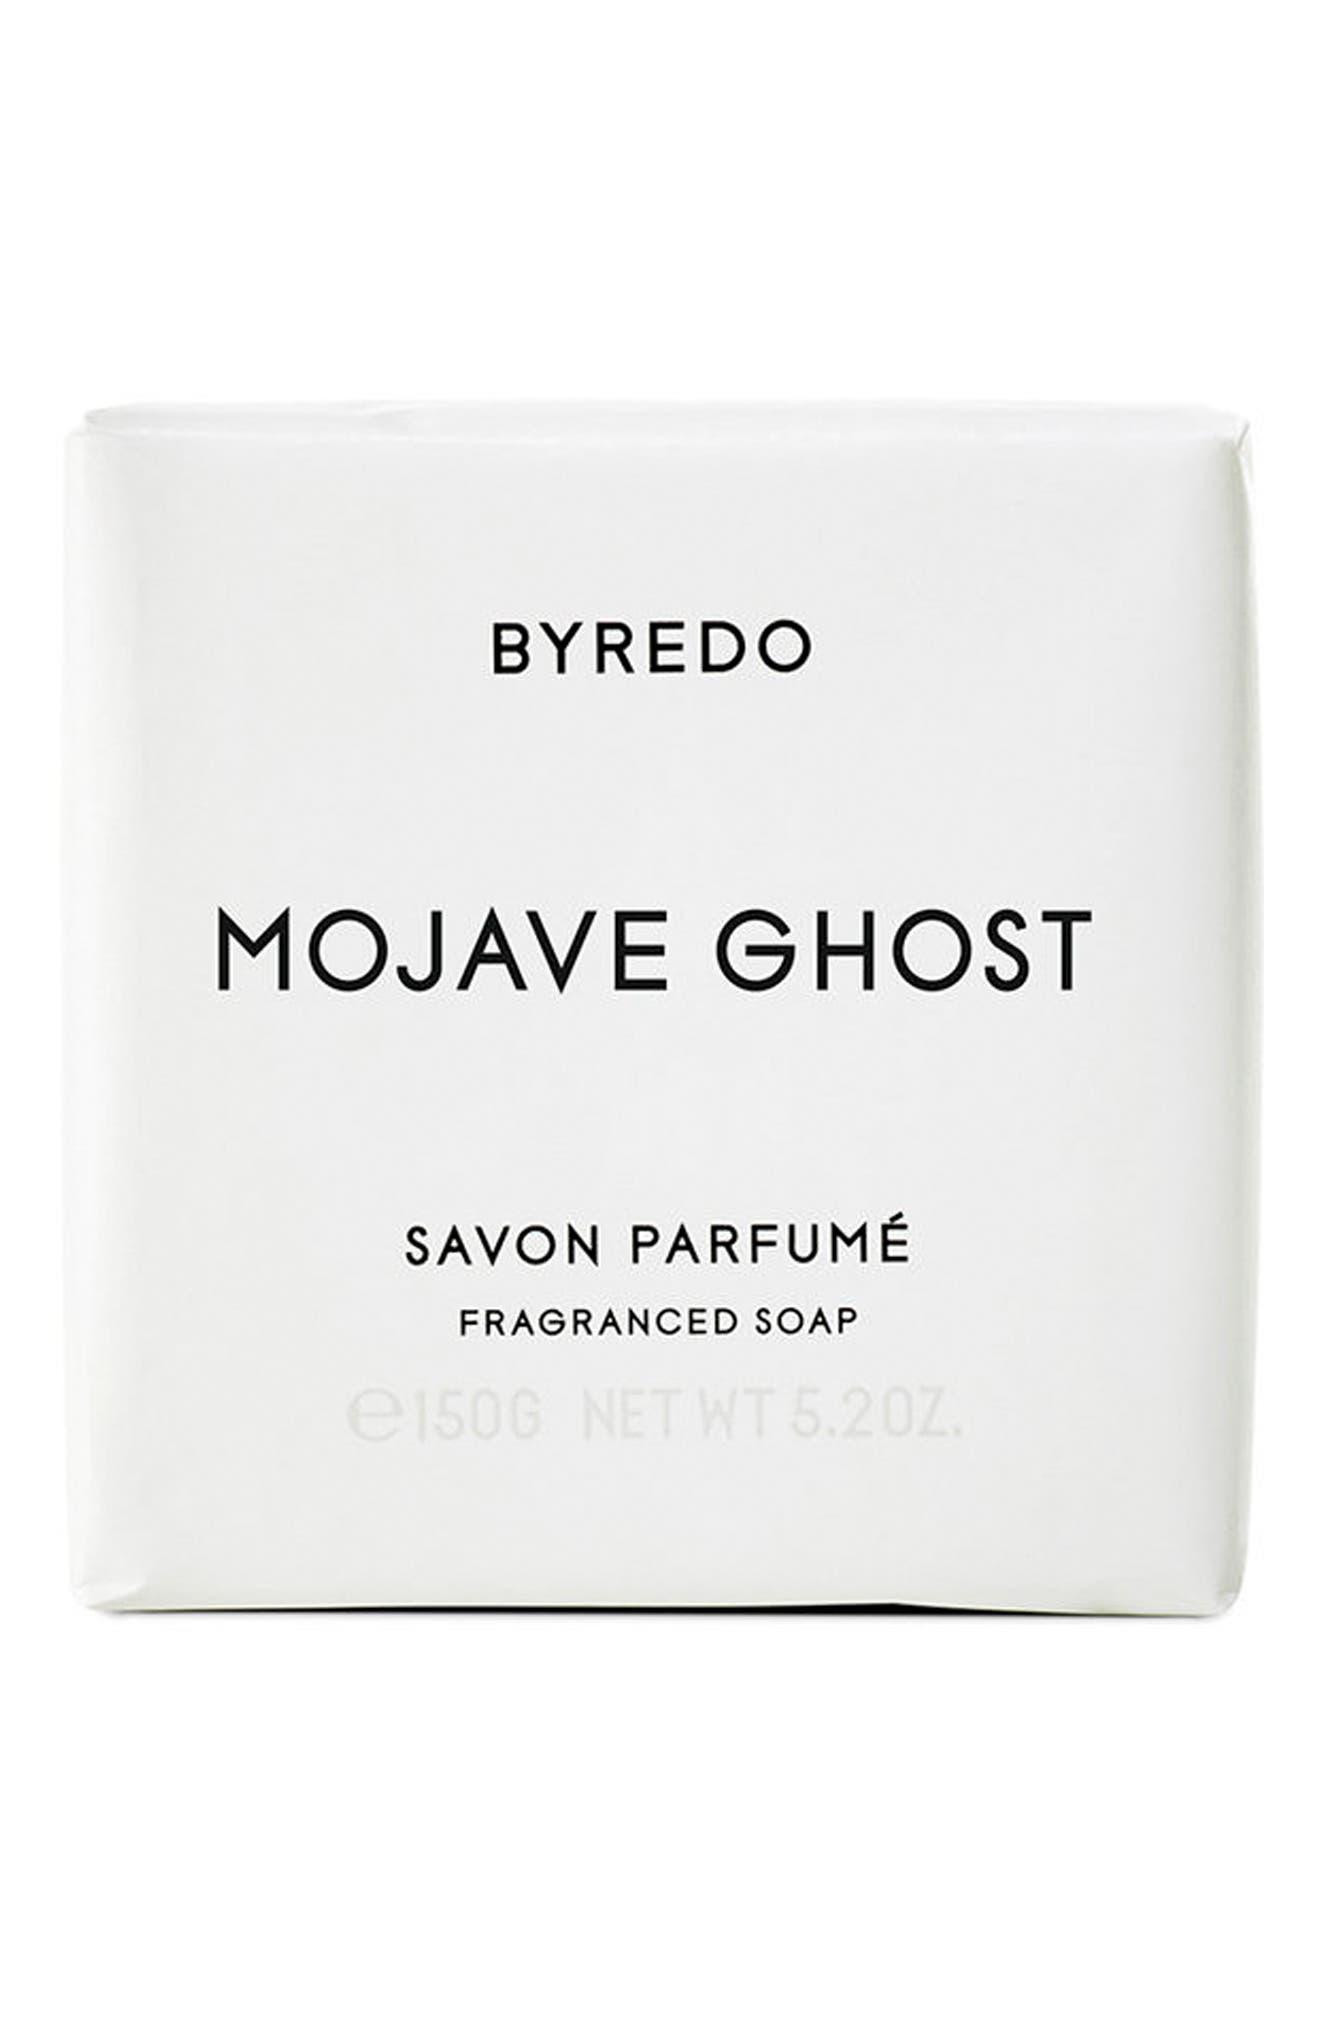 BYREDO Mojave Ghost Soap Bar